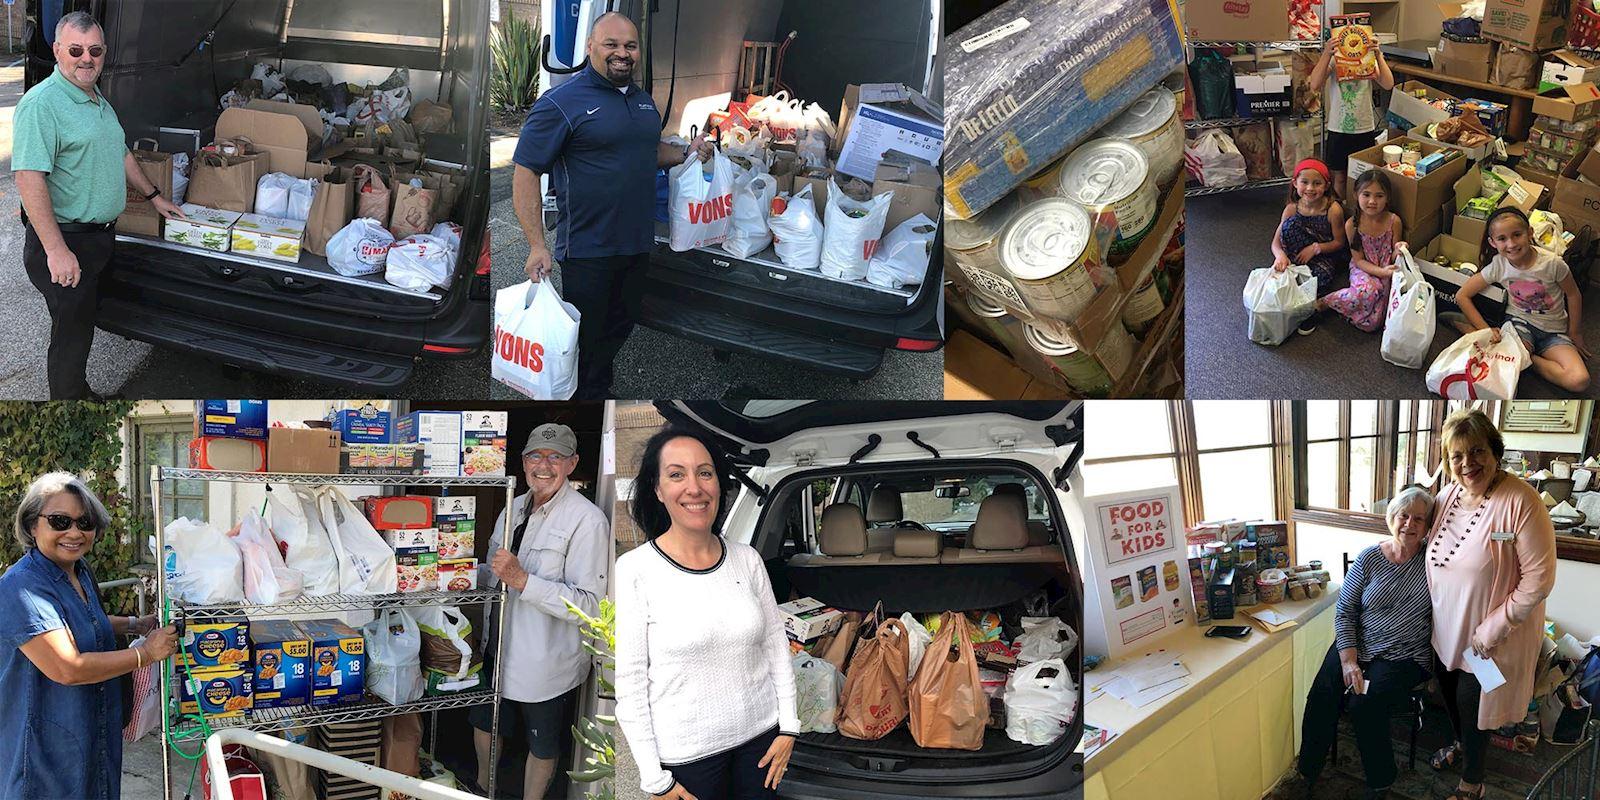 Food For Kids Donations - November 2019